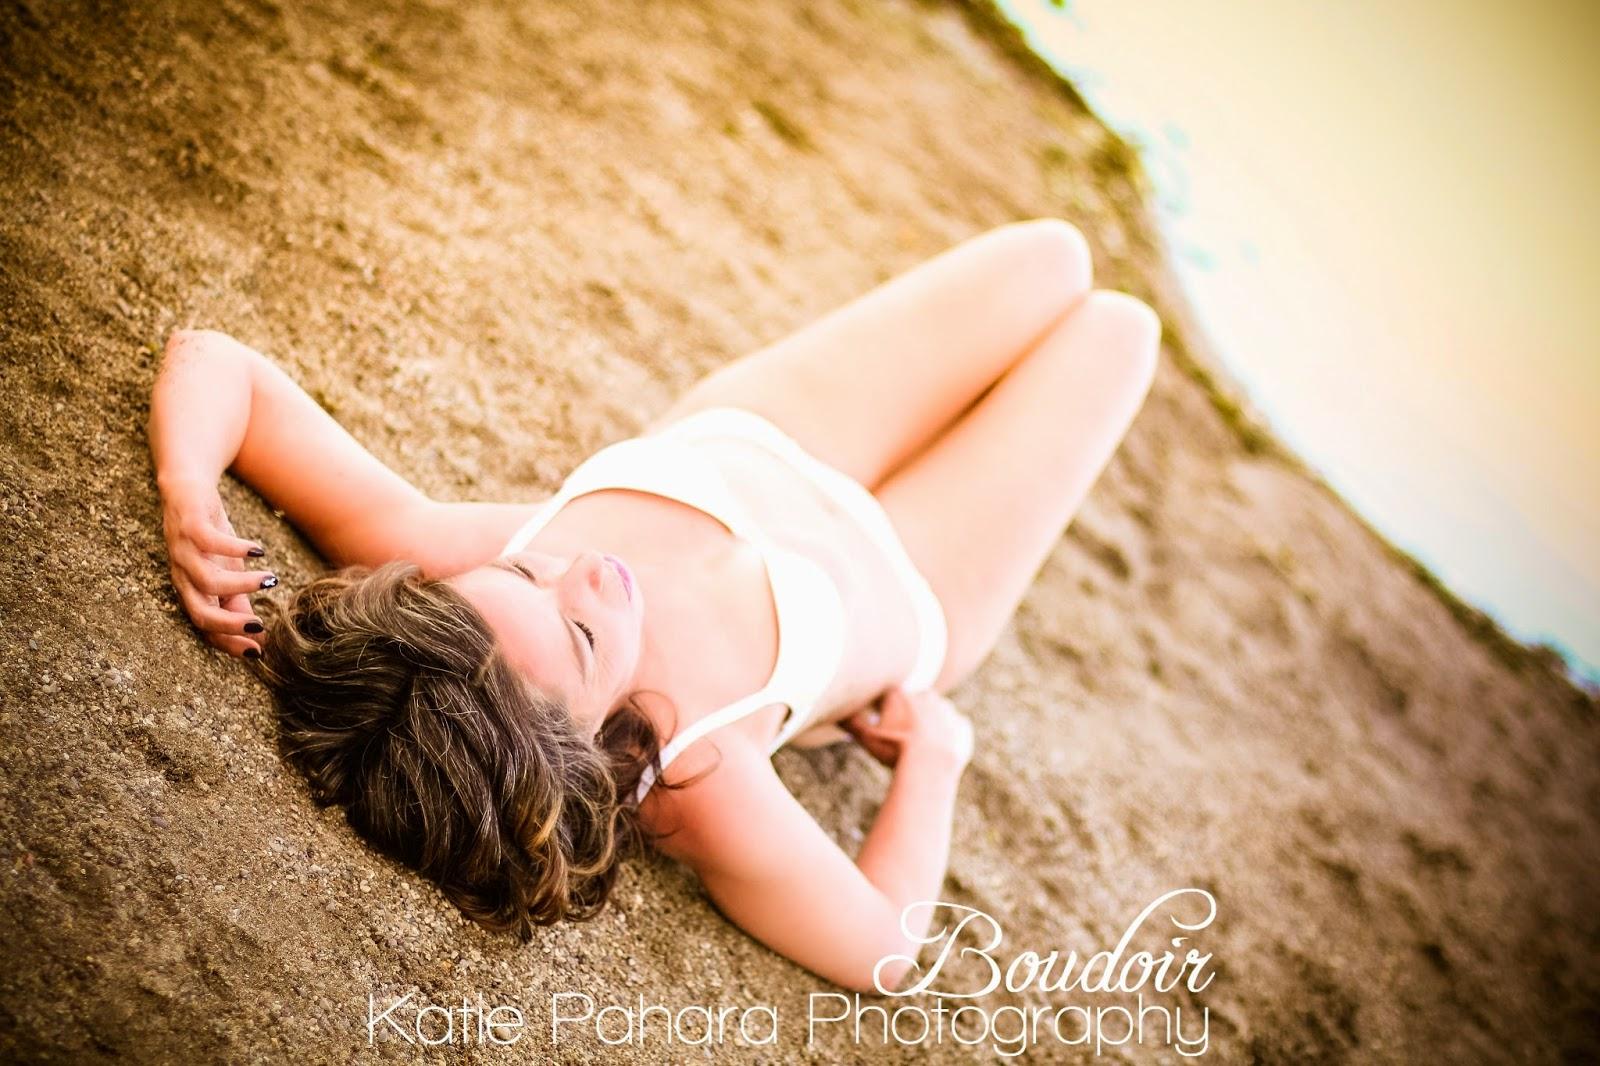 Beach Boudoir Photography Lethbridge